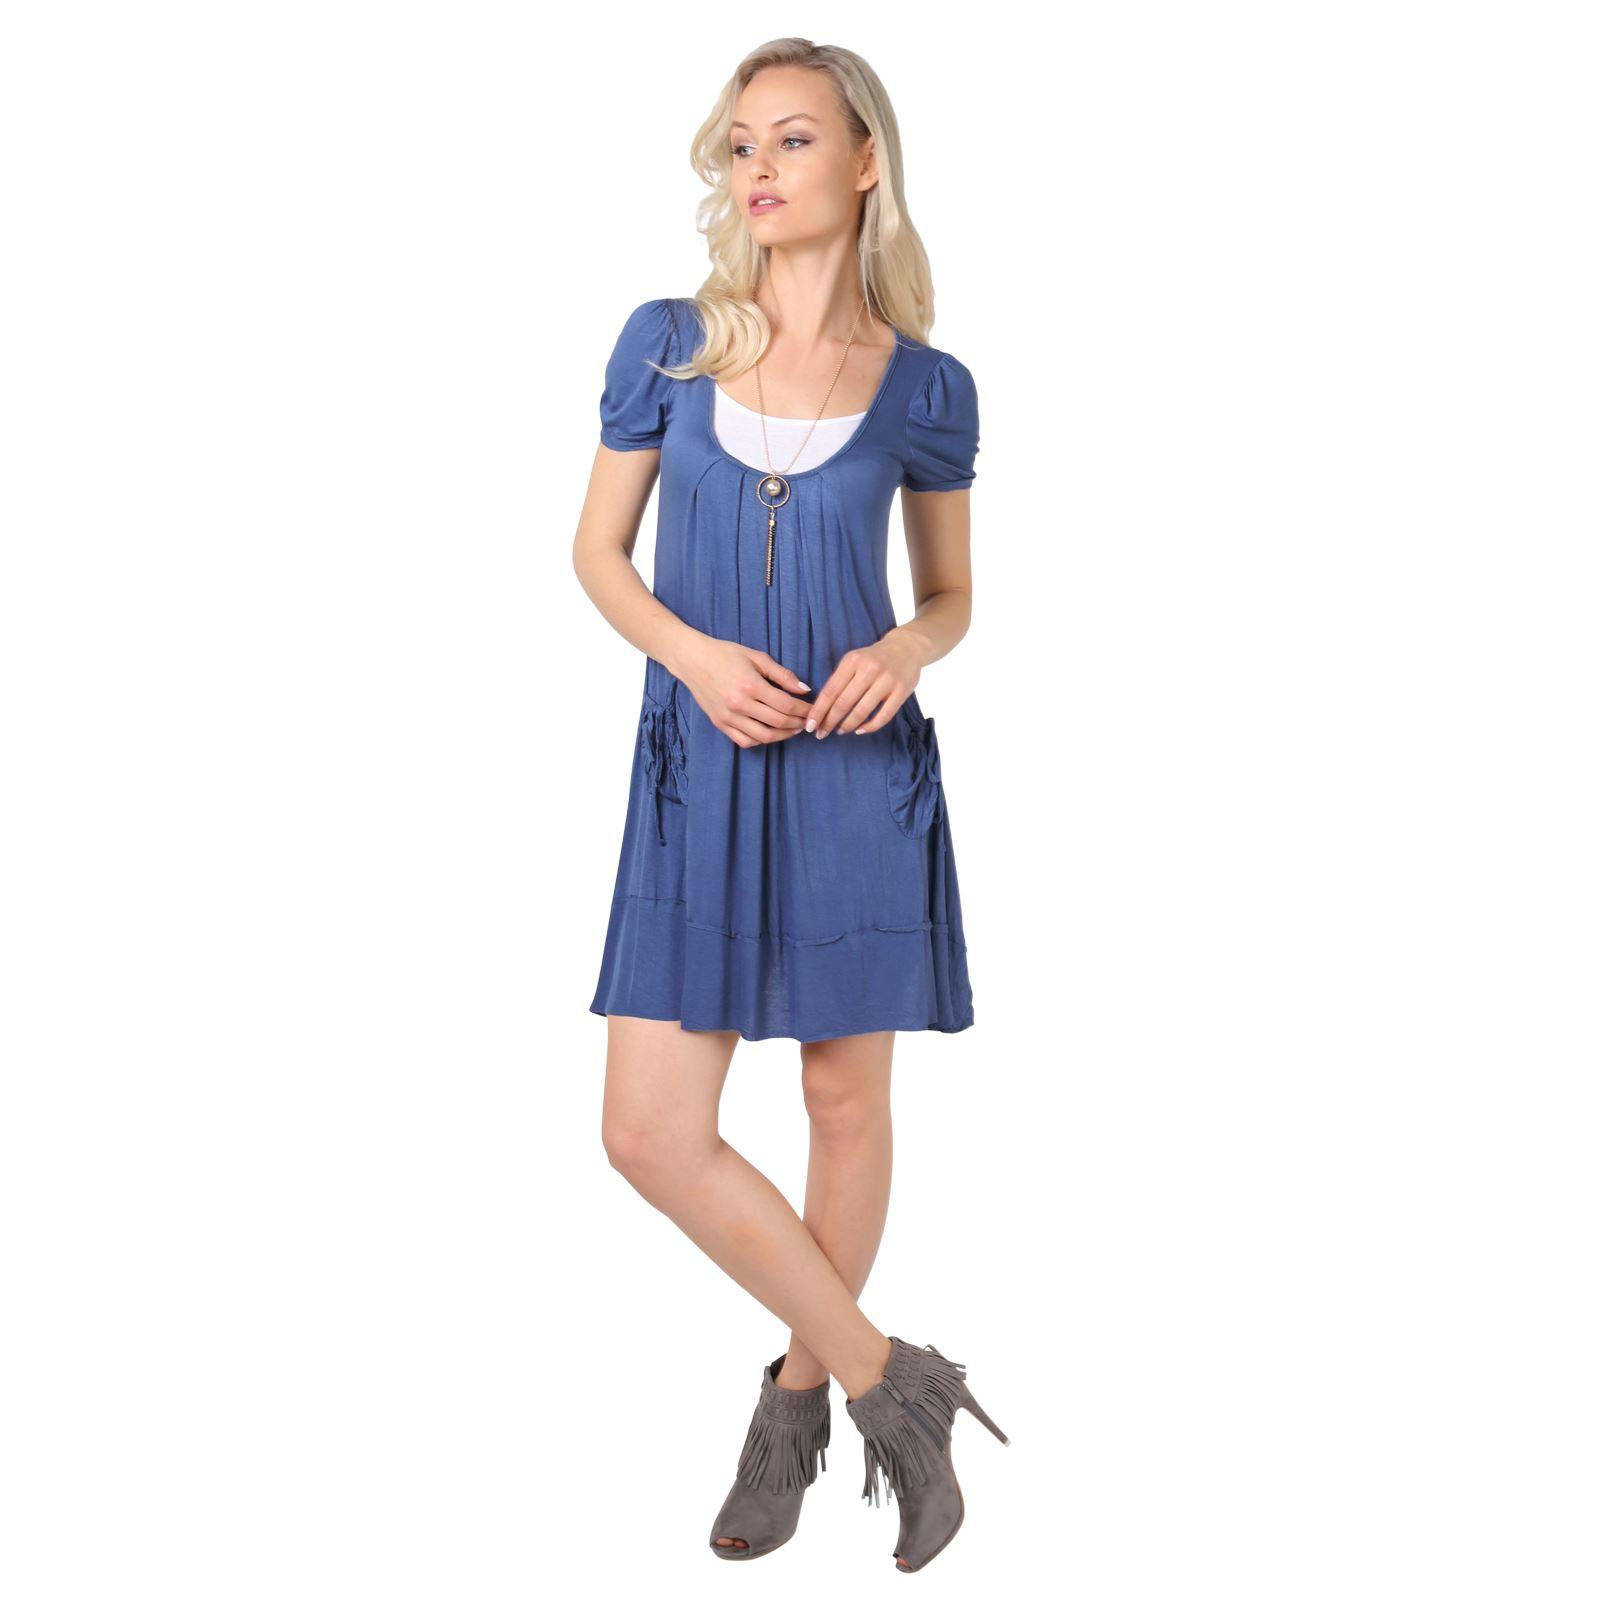 KRISP-Women-2-in-1-Boho-Gypsy-Tunic-Dress-Top-Tee-Jersey-Pleated-A-Line-Necklace thumbnail 9